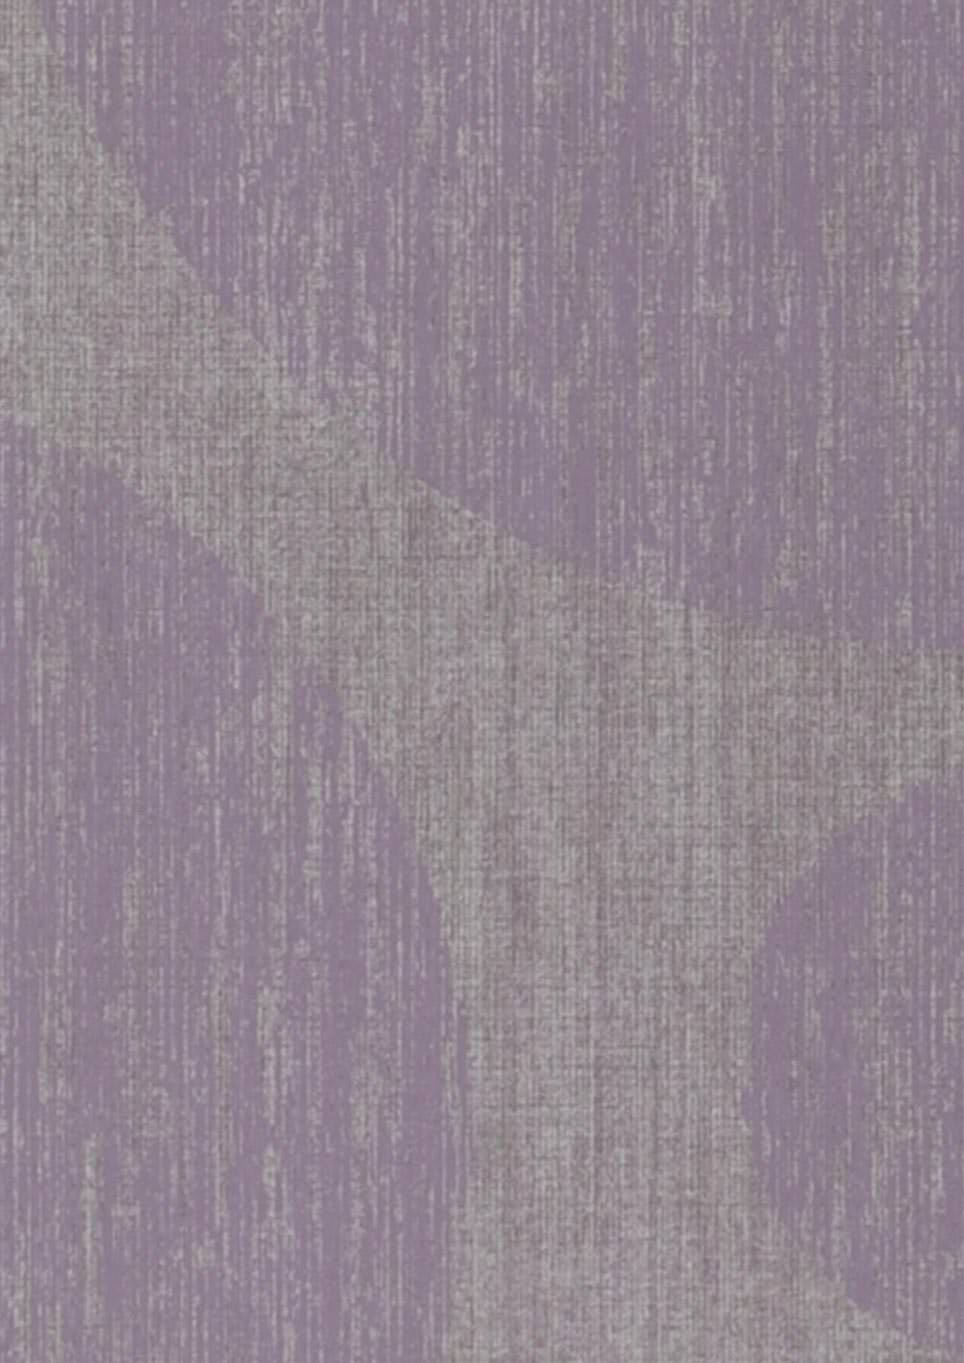 Papel pintado sabulana violeta pastel plata violeta for Papel pintado color plata